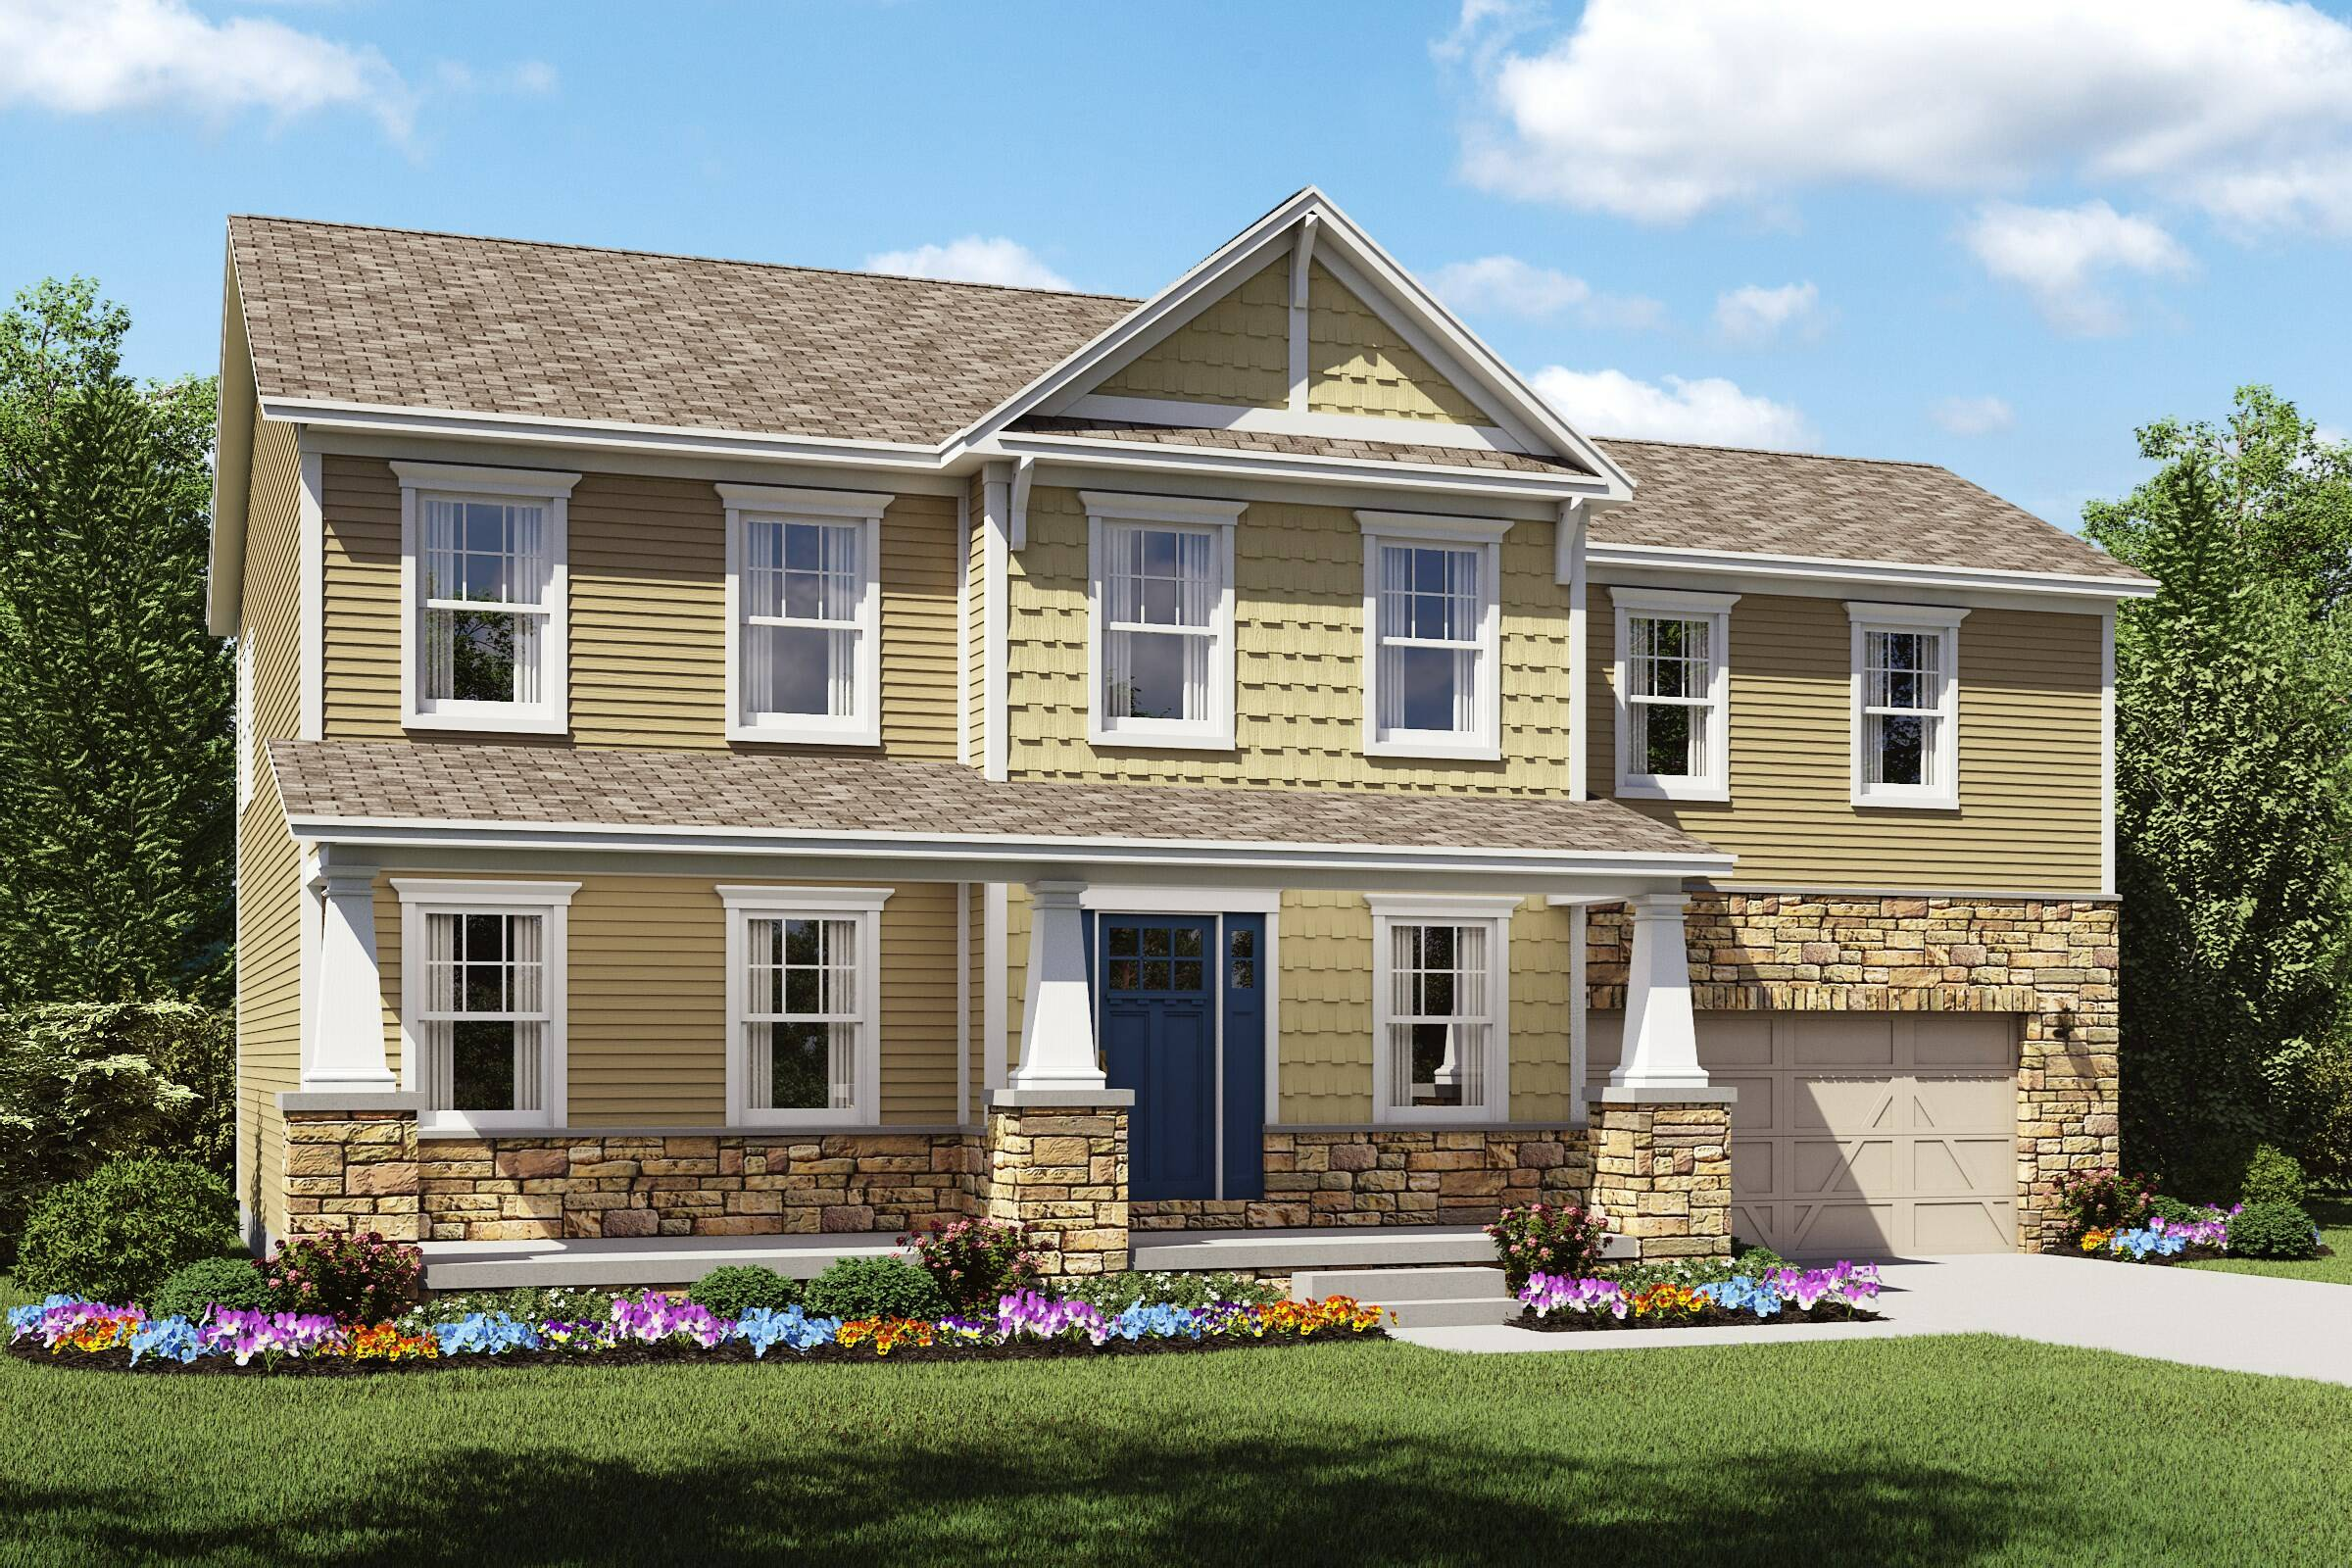 Home Builders In Cygnet Ohio K Hovnanian Homes